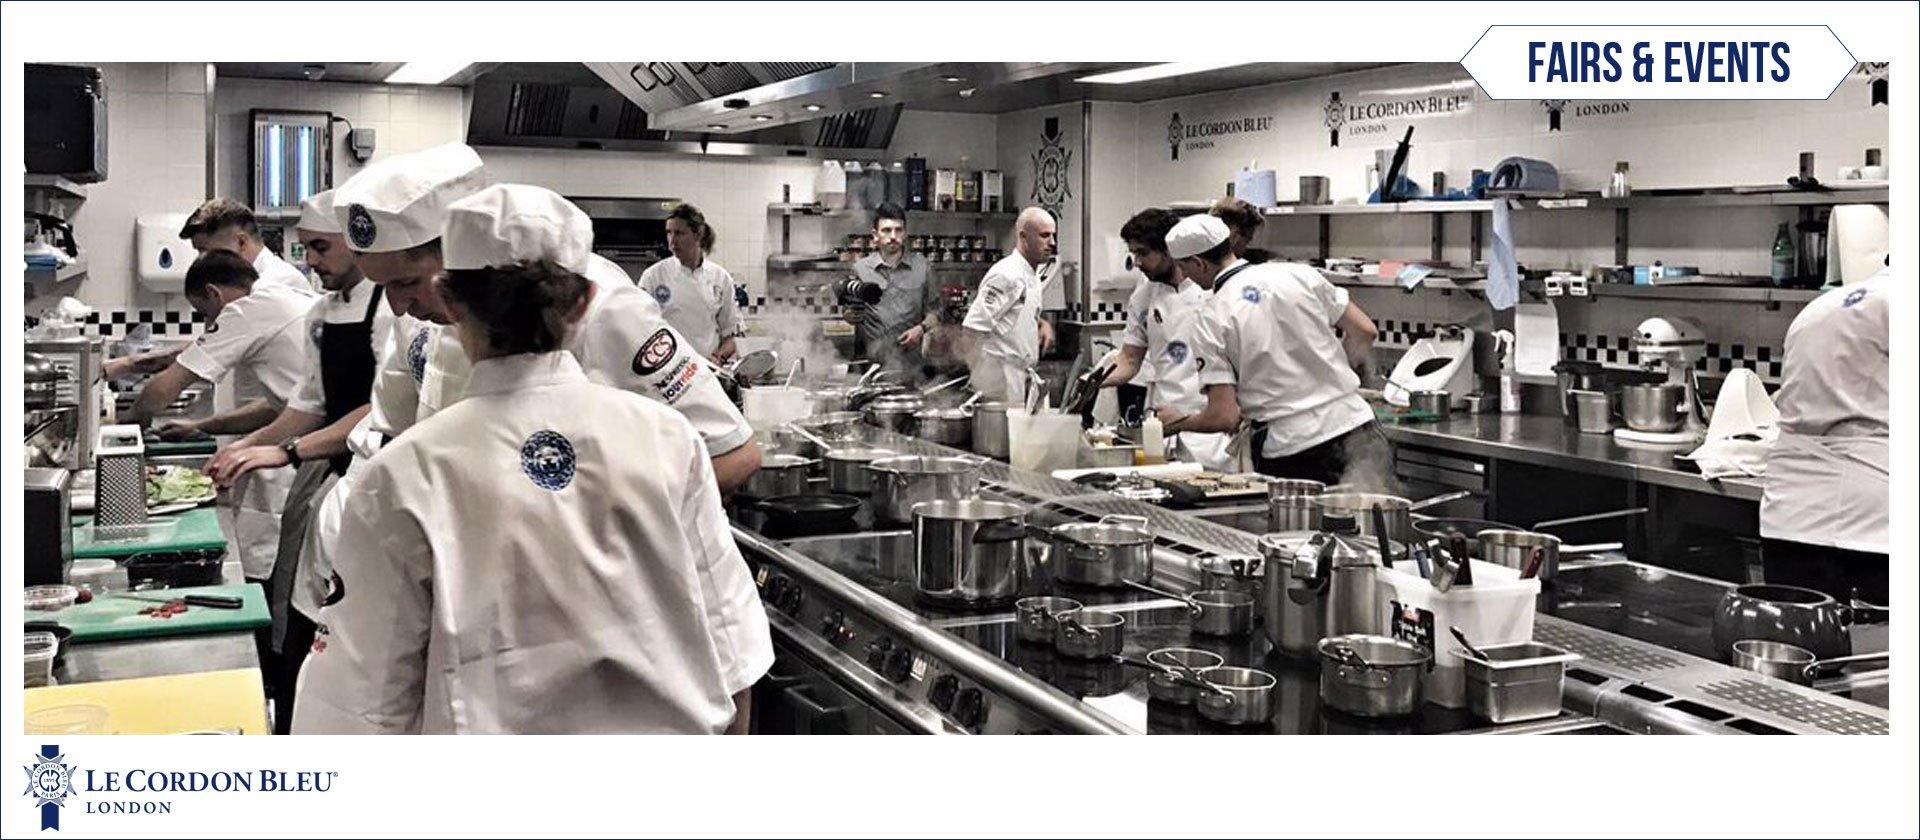 Le Cordon Bleu host National Chef of the Year Semi-Final 2017